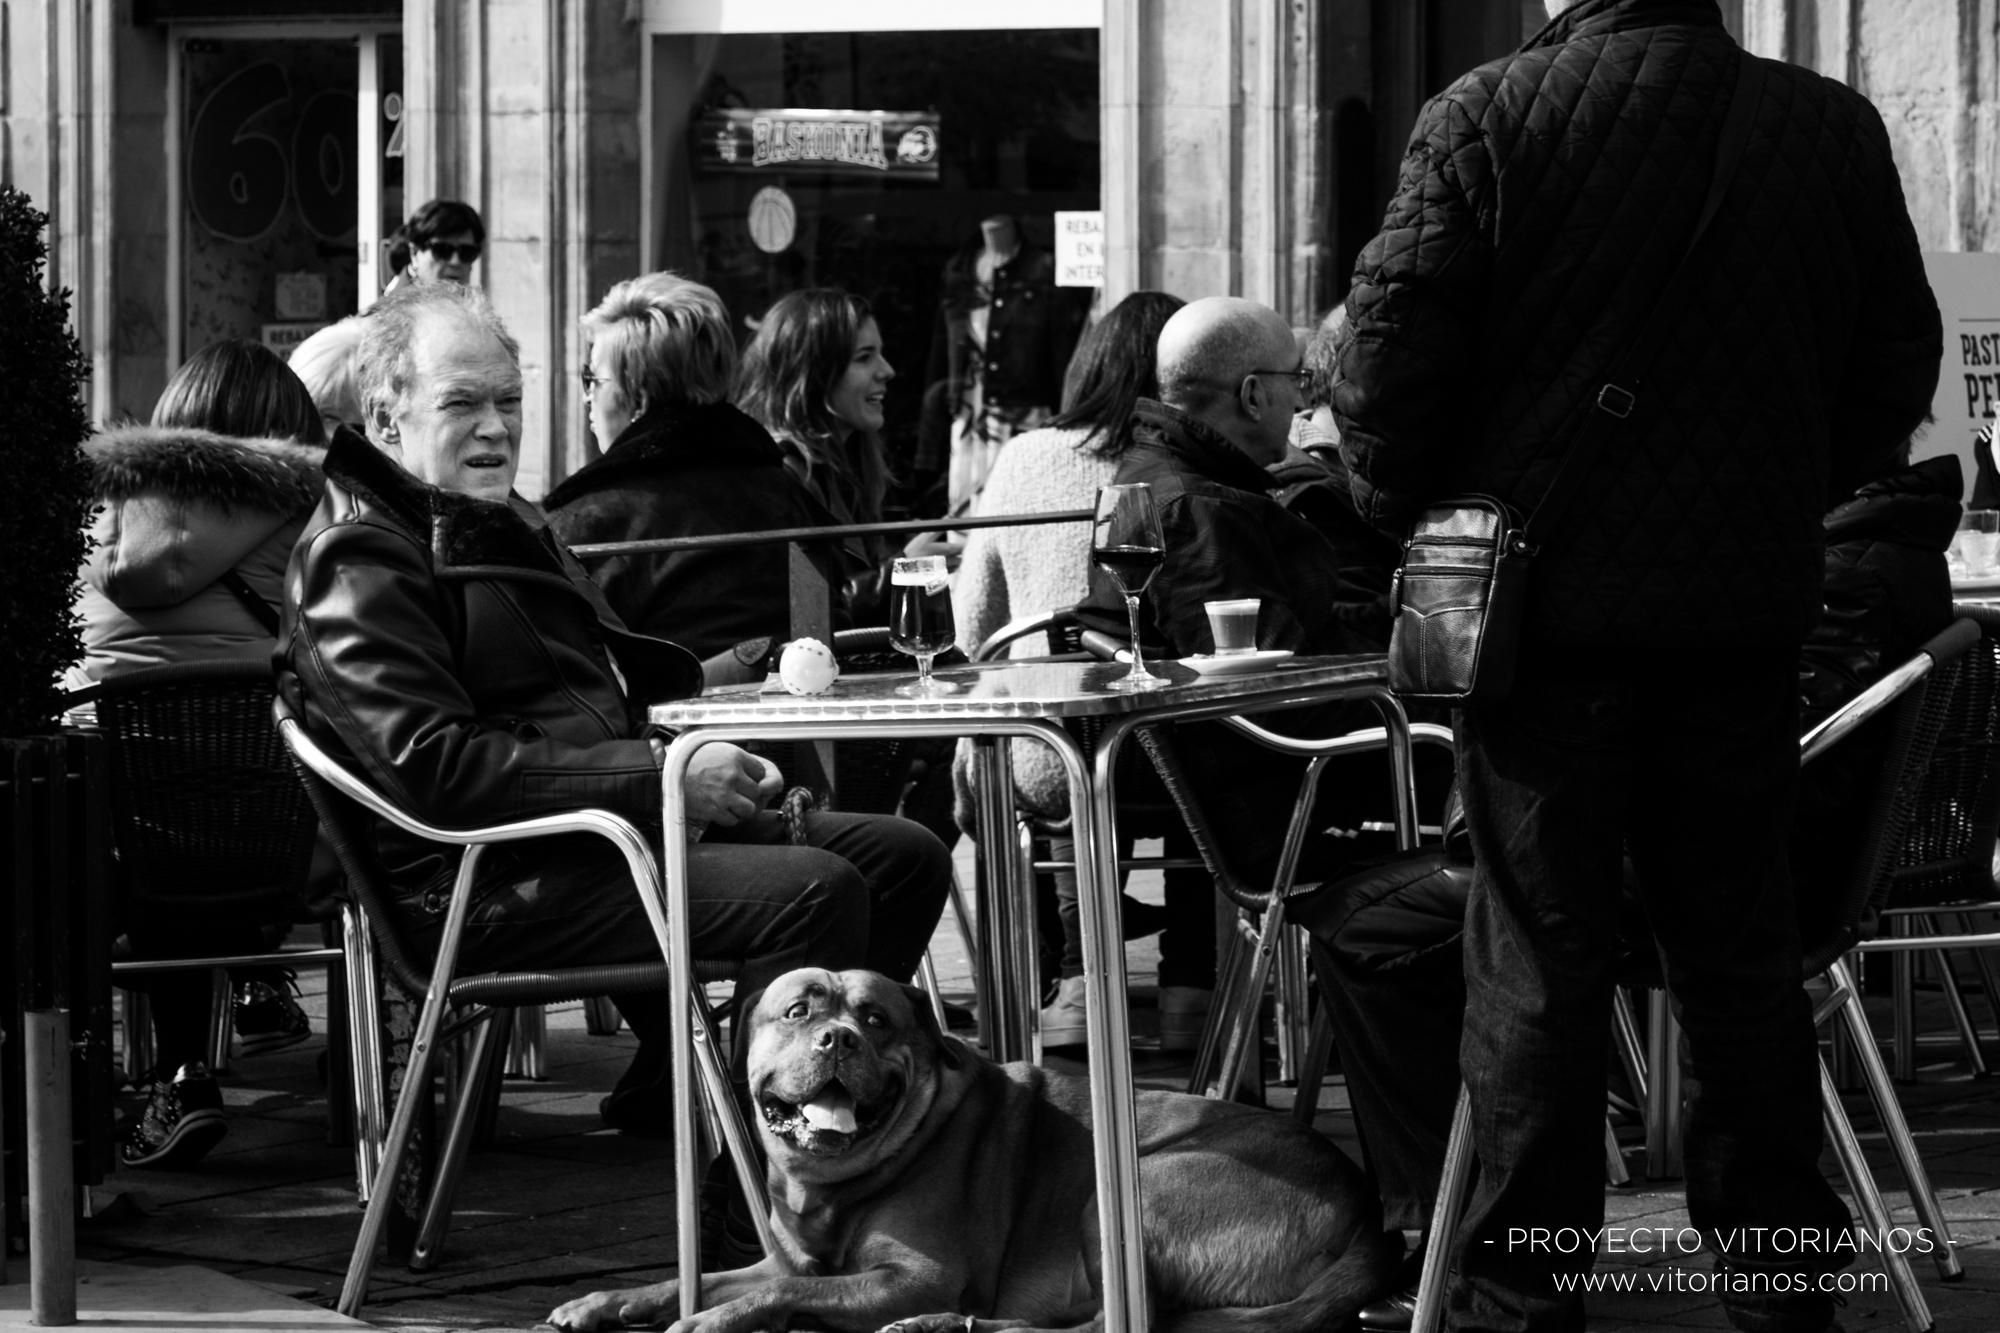 Vitoriano y su perro - Foto: Ainhoa Suso